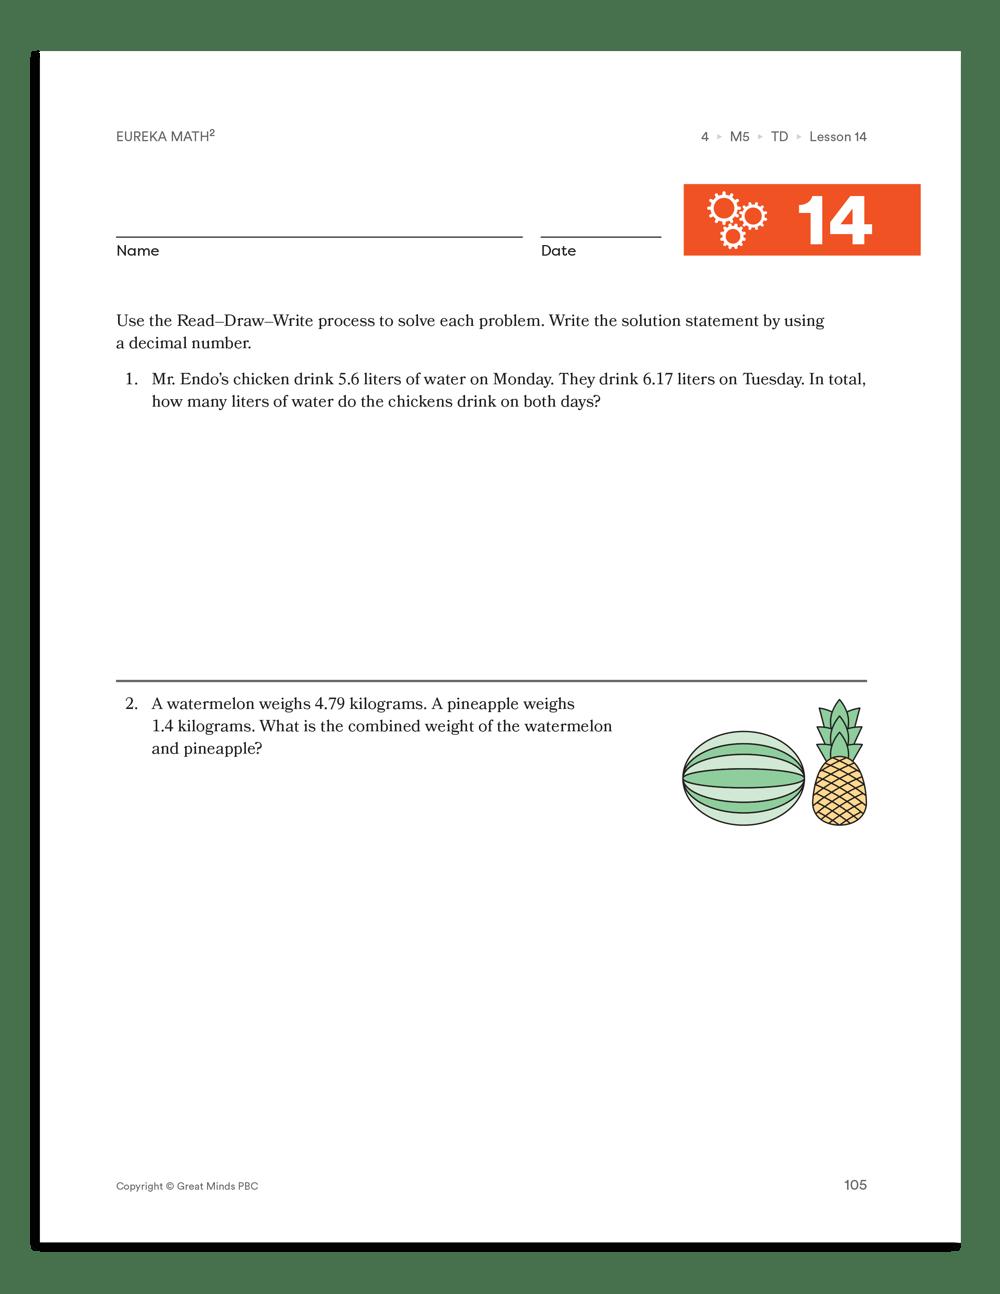 EM2-Learn-Student